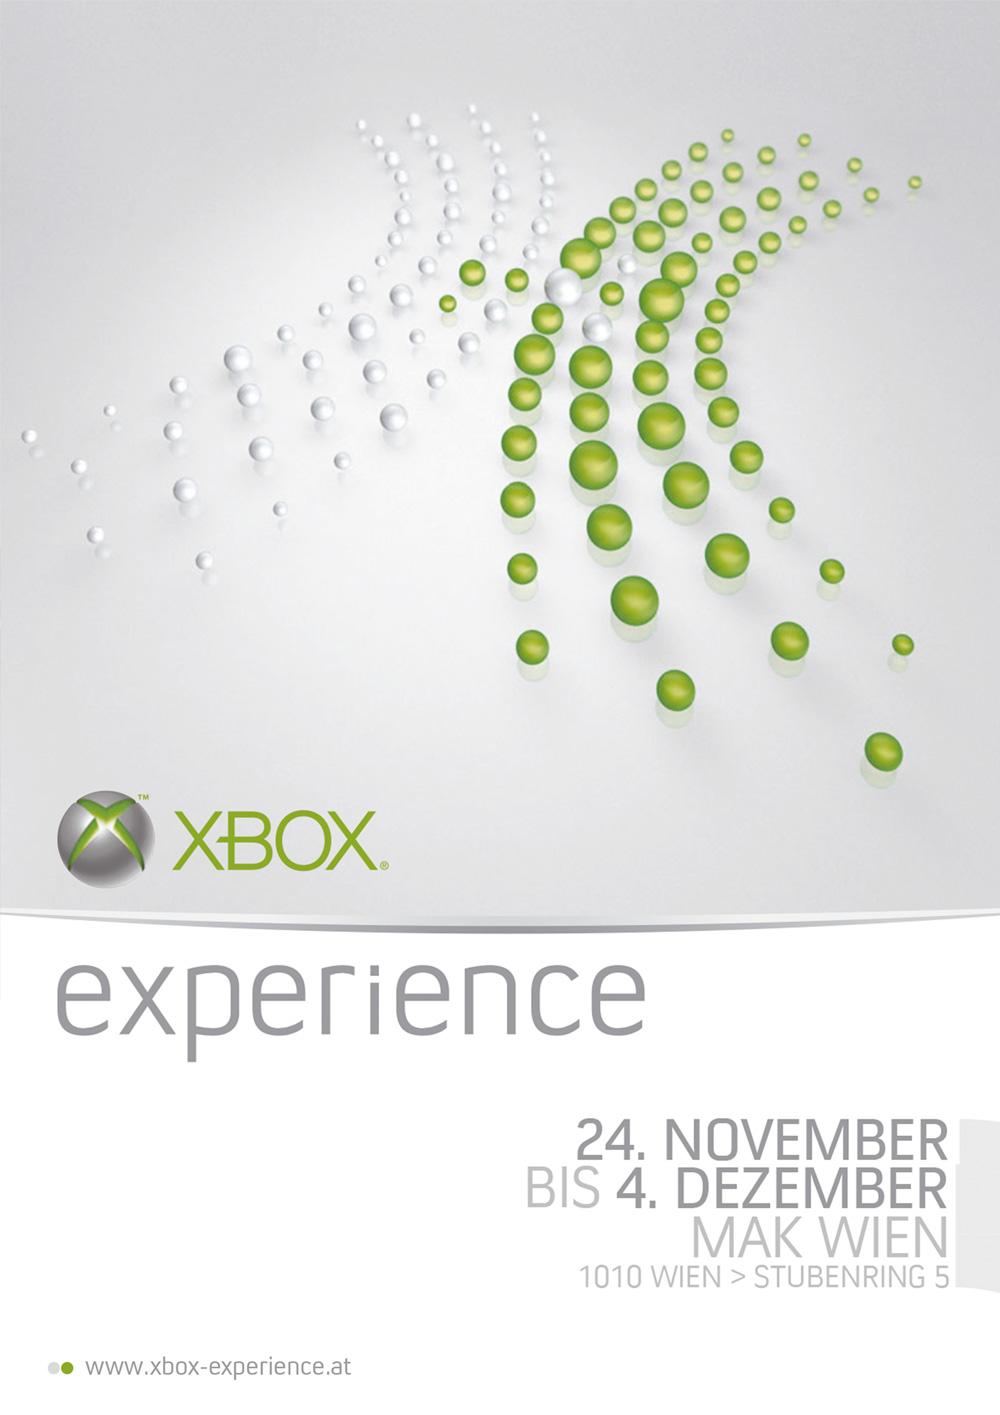 microsoft_poster_experience2.jpg